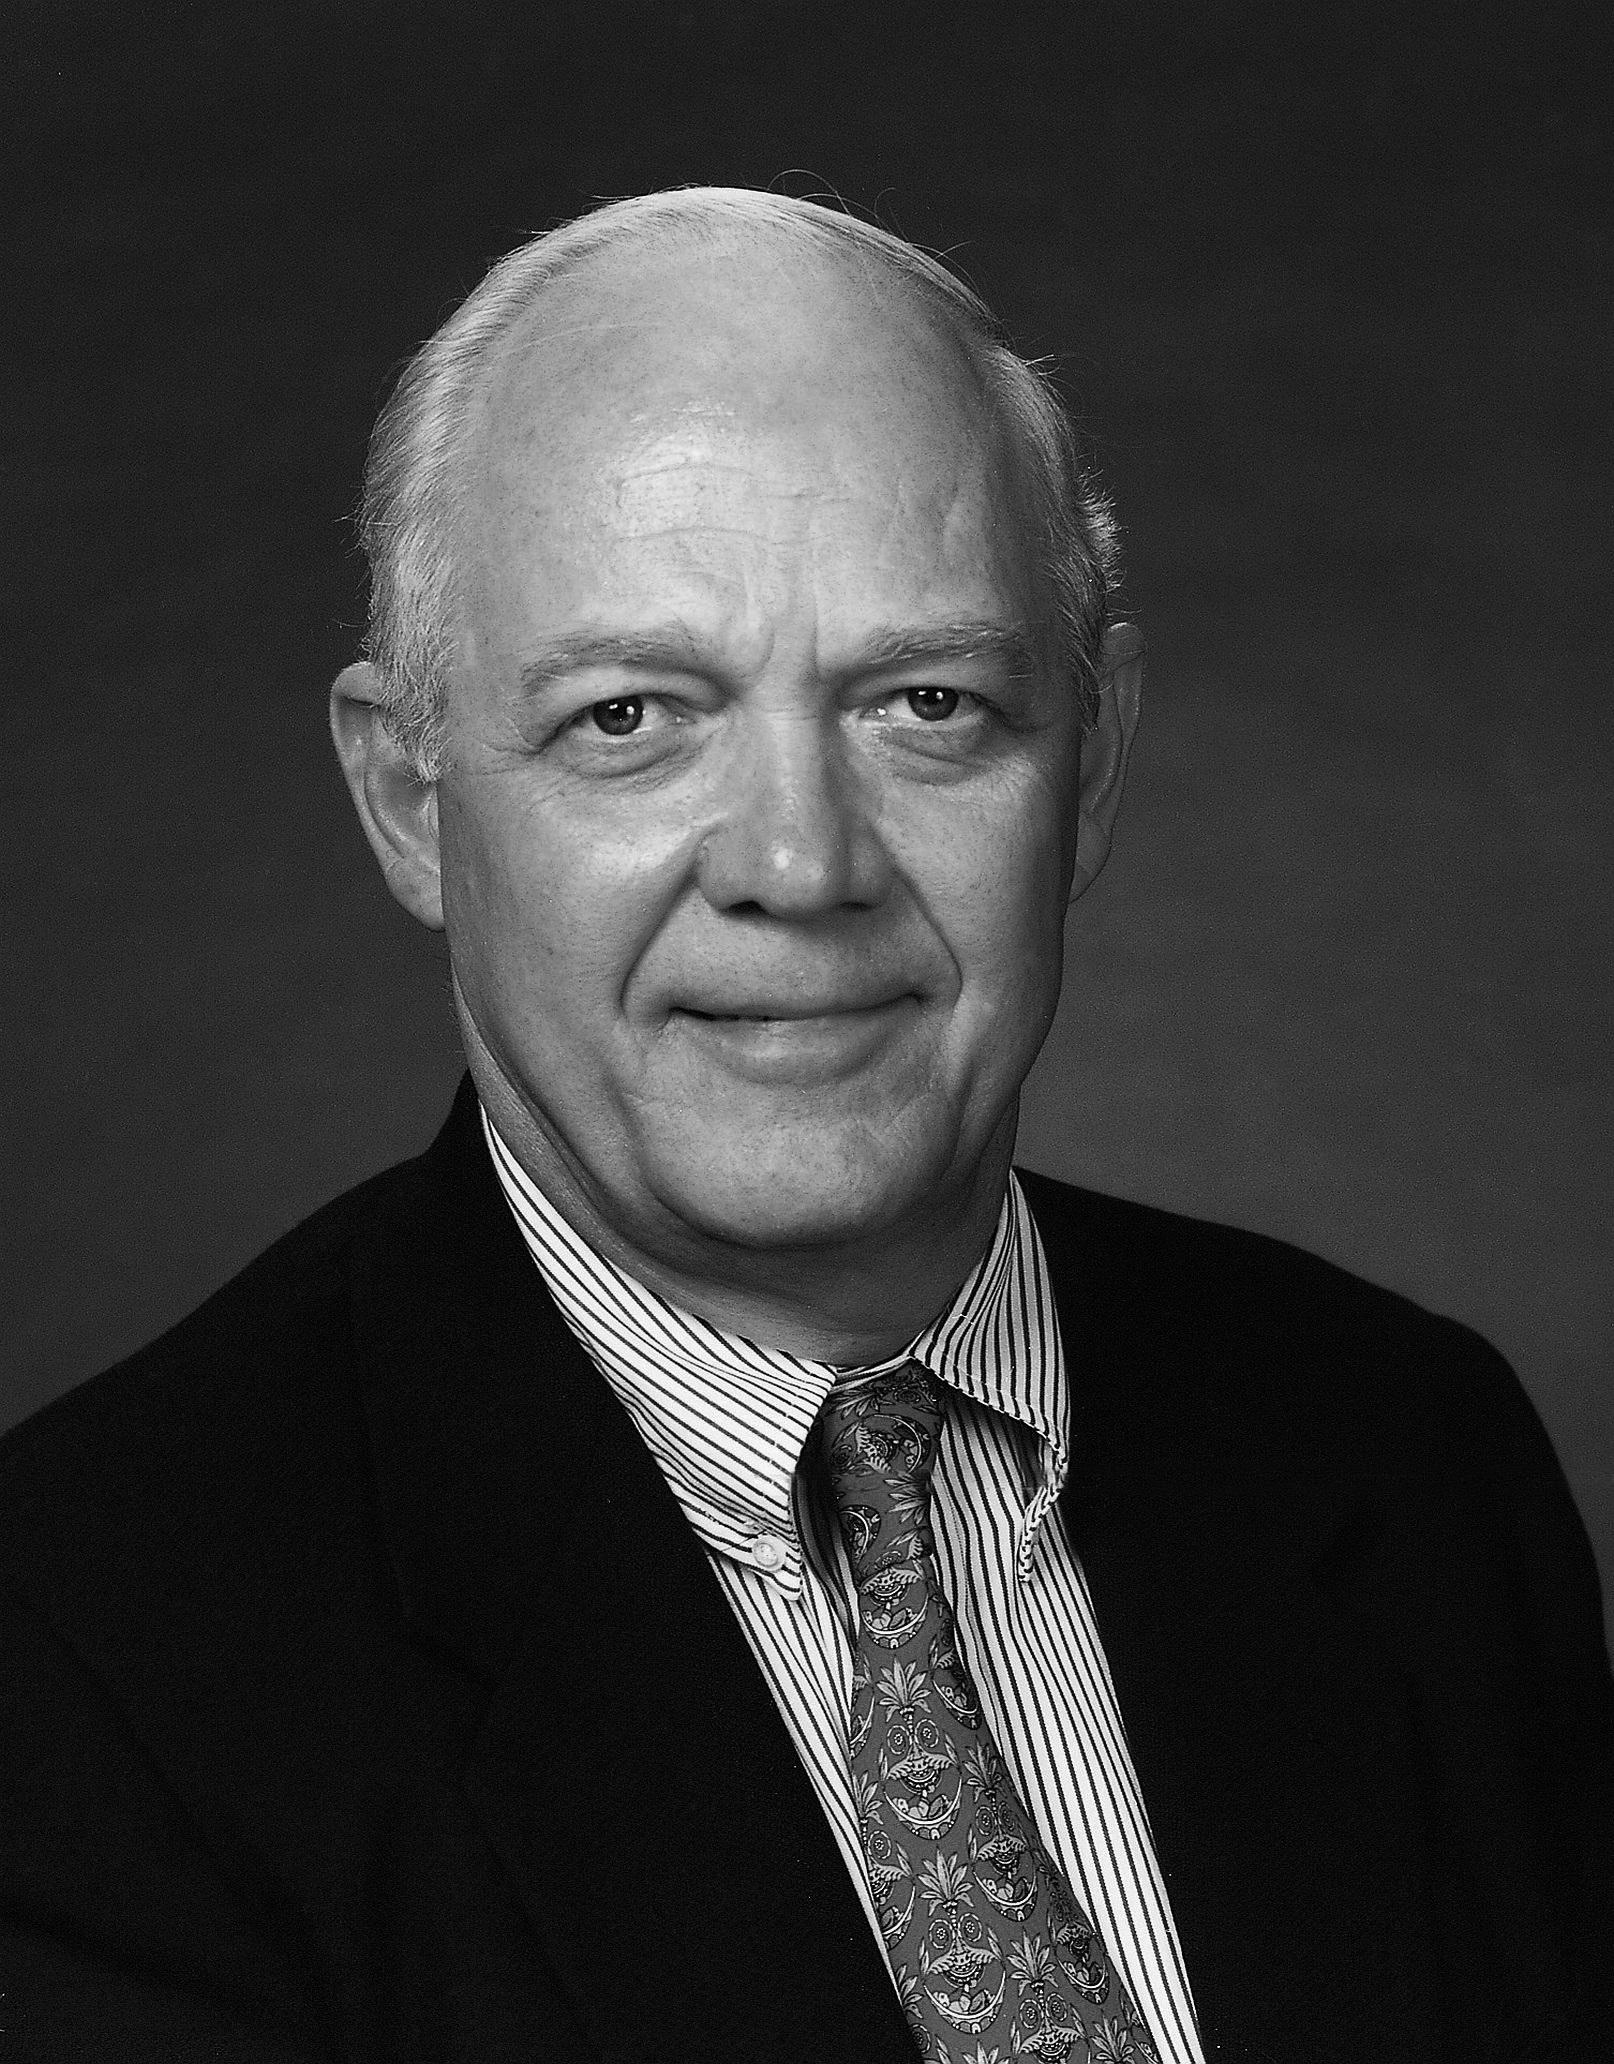 John D. Bassett, III